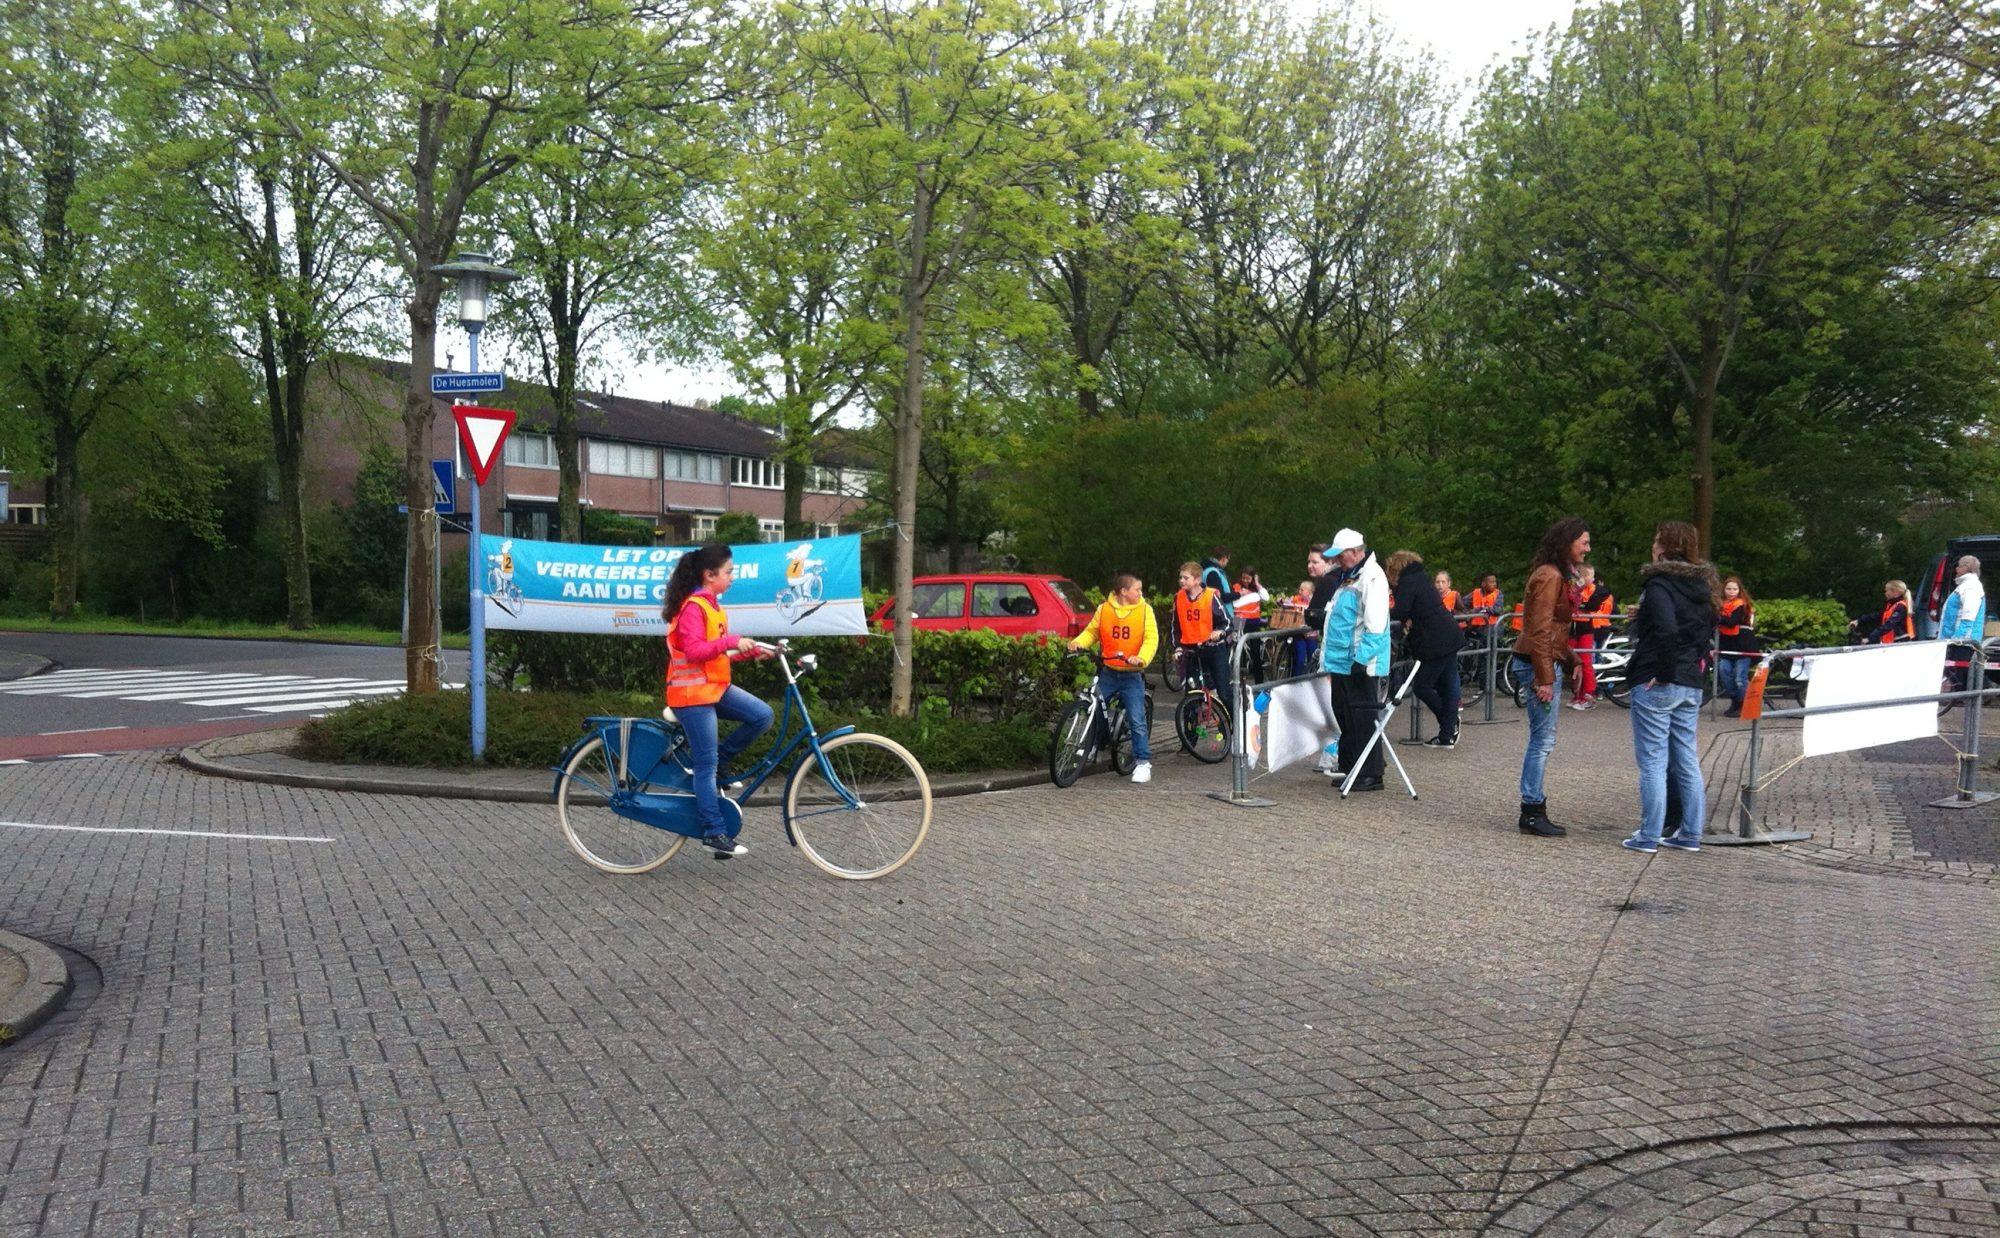 Vanaf vandaag verkeersexamen in Hoorn